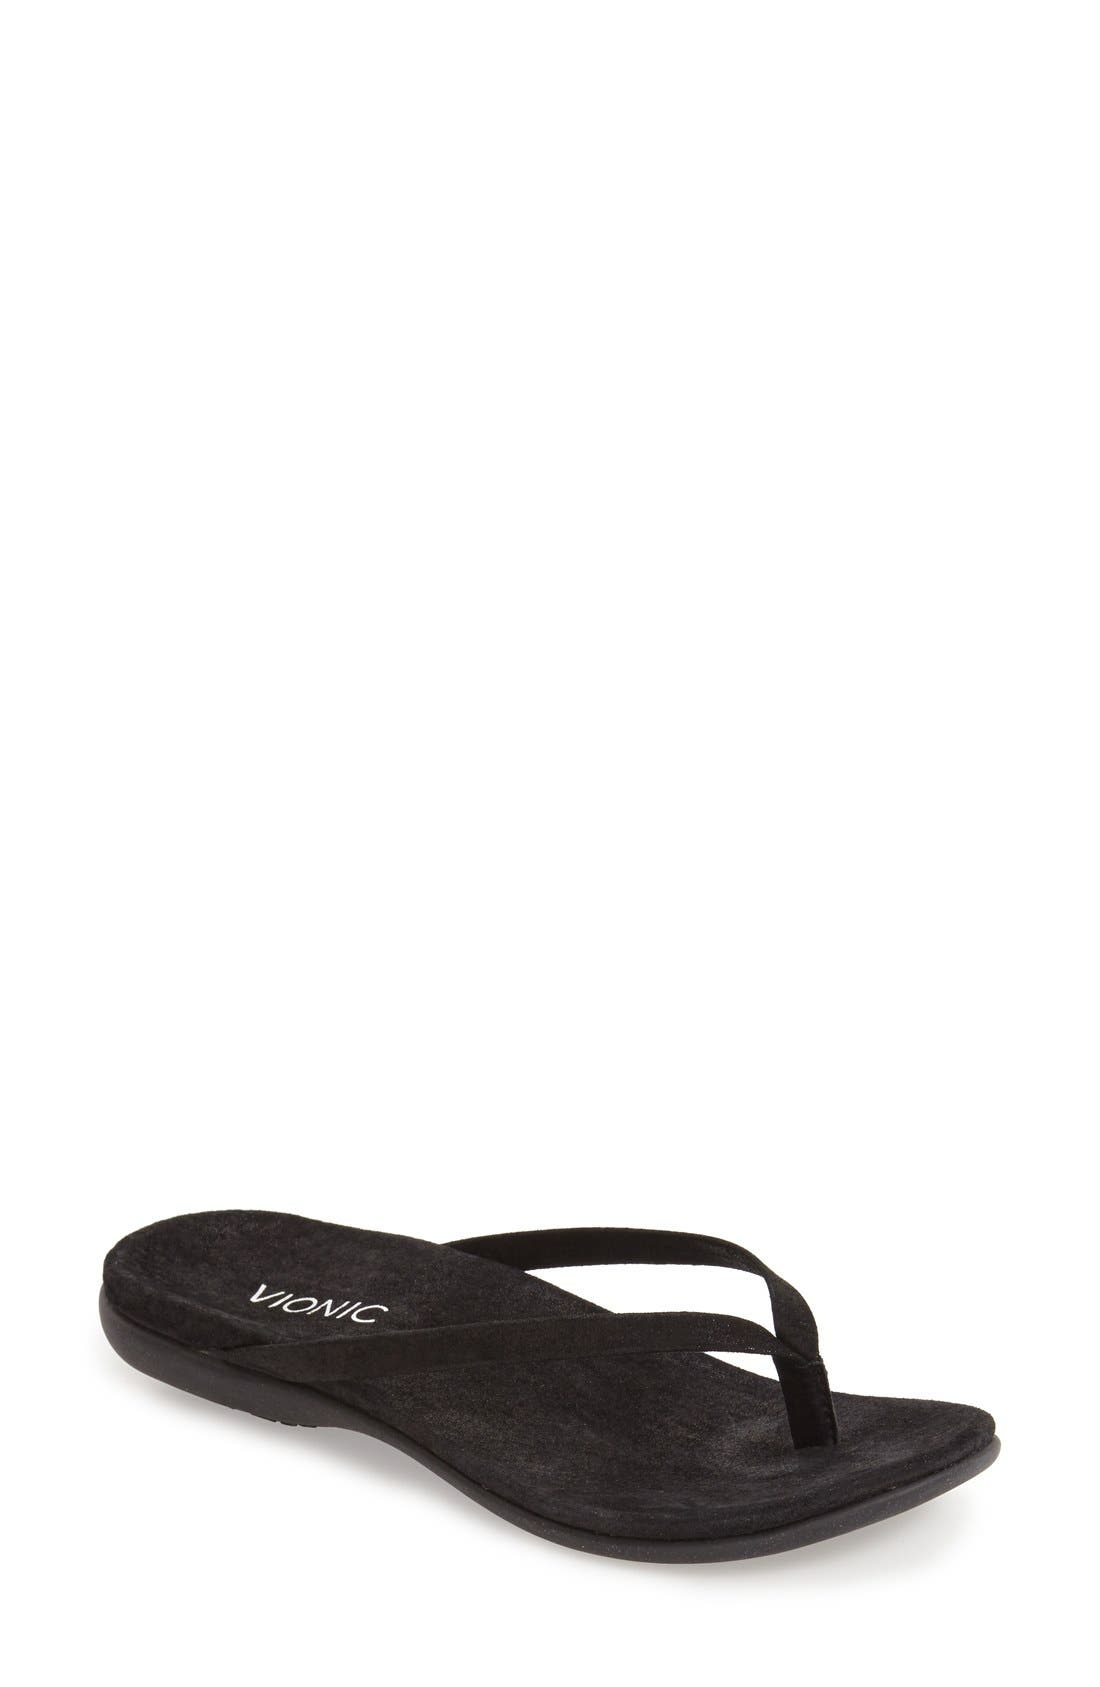 Main Image - Vionic 'Corfu' Sandal (Women)